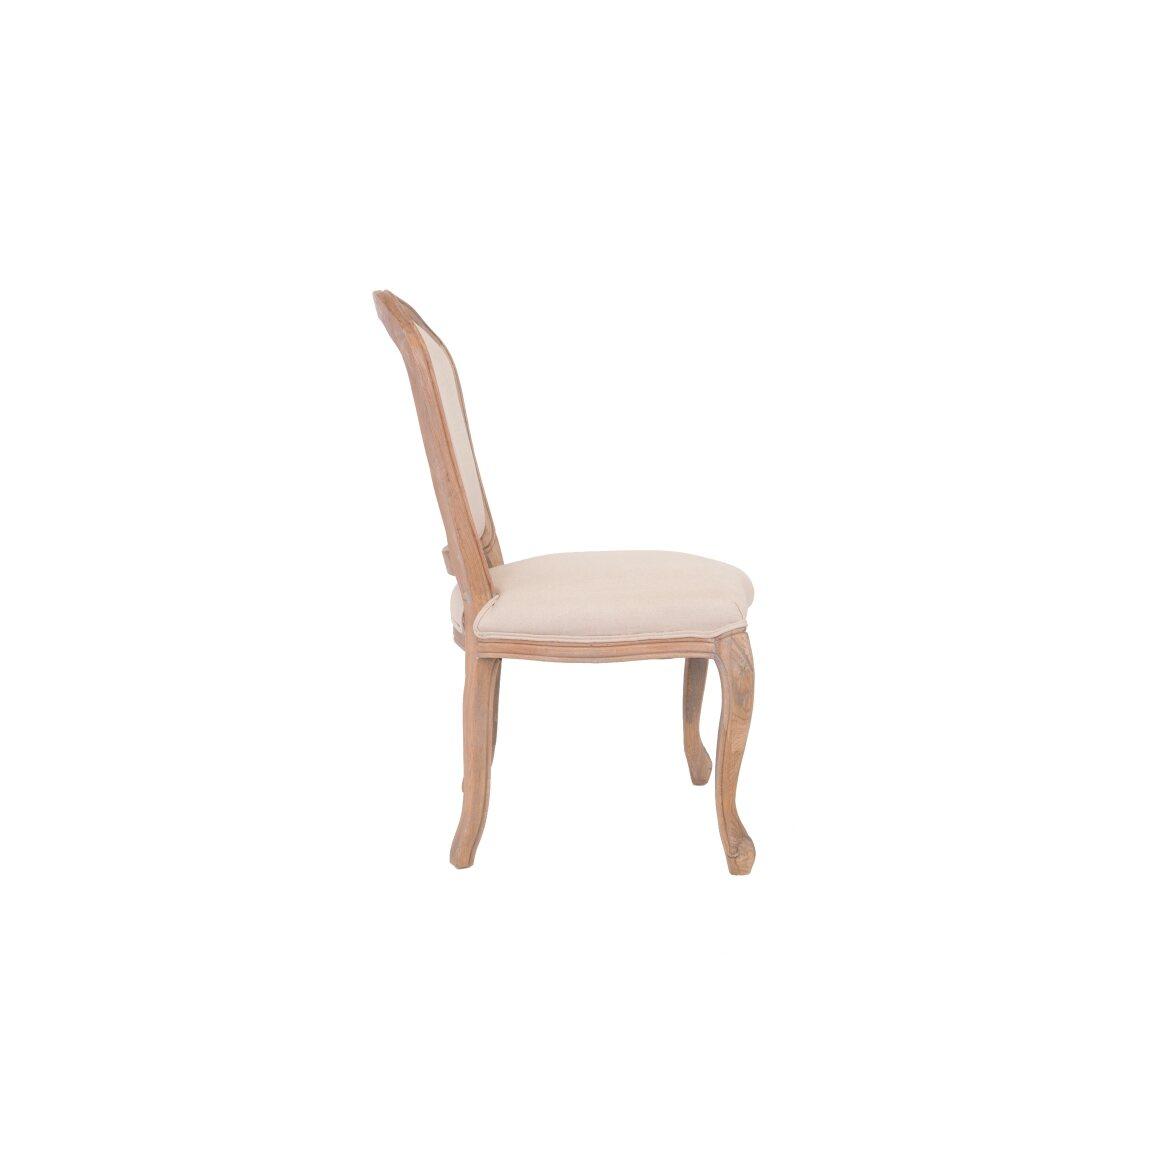 Стул Granes beige 2   Обеденные стулья Kingsby